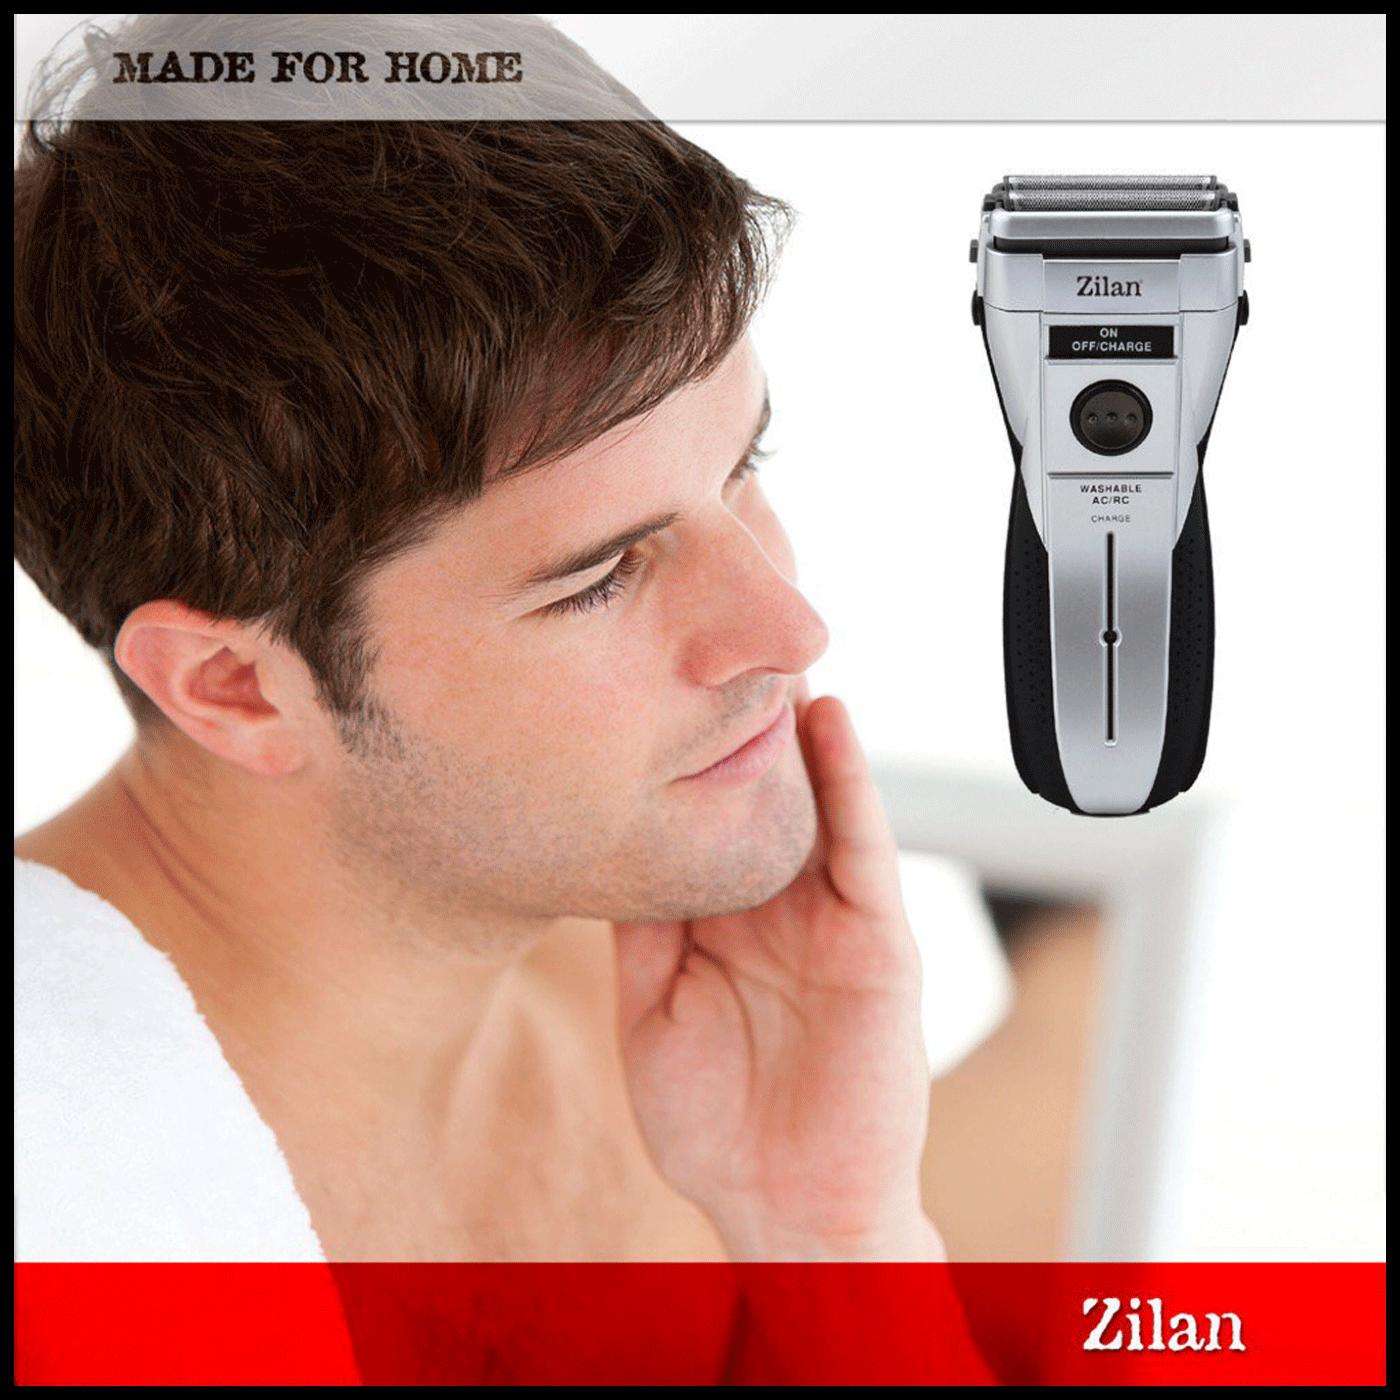 Aparat za brijanje, vodootporan